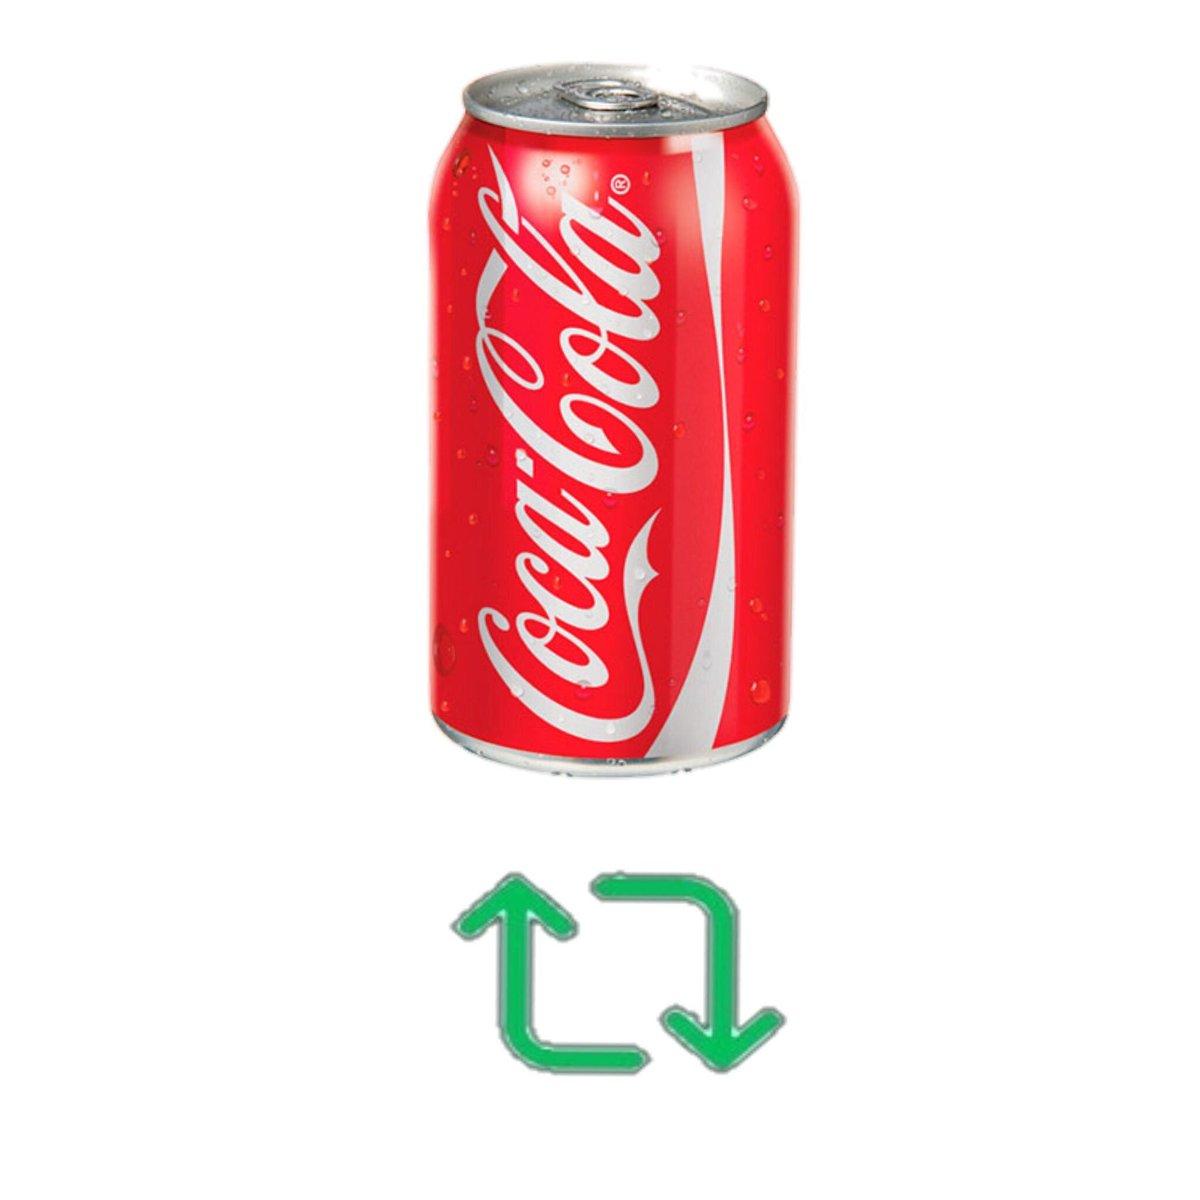 Coca ou Pepsi